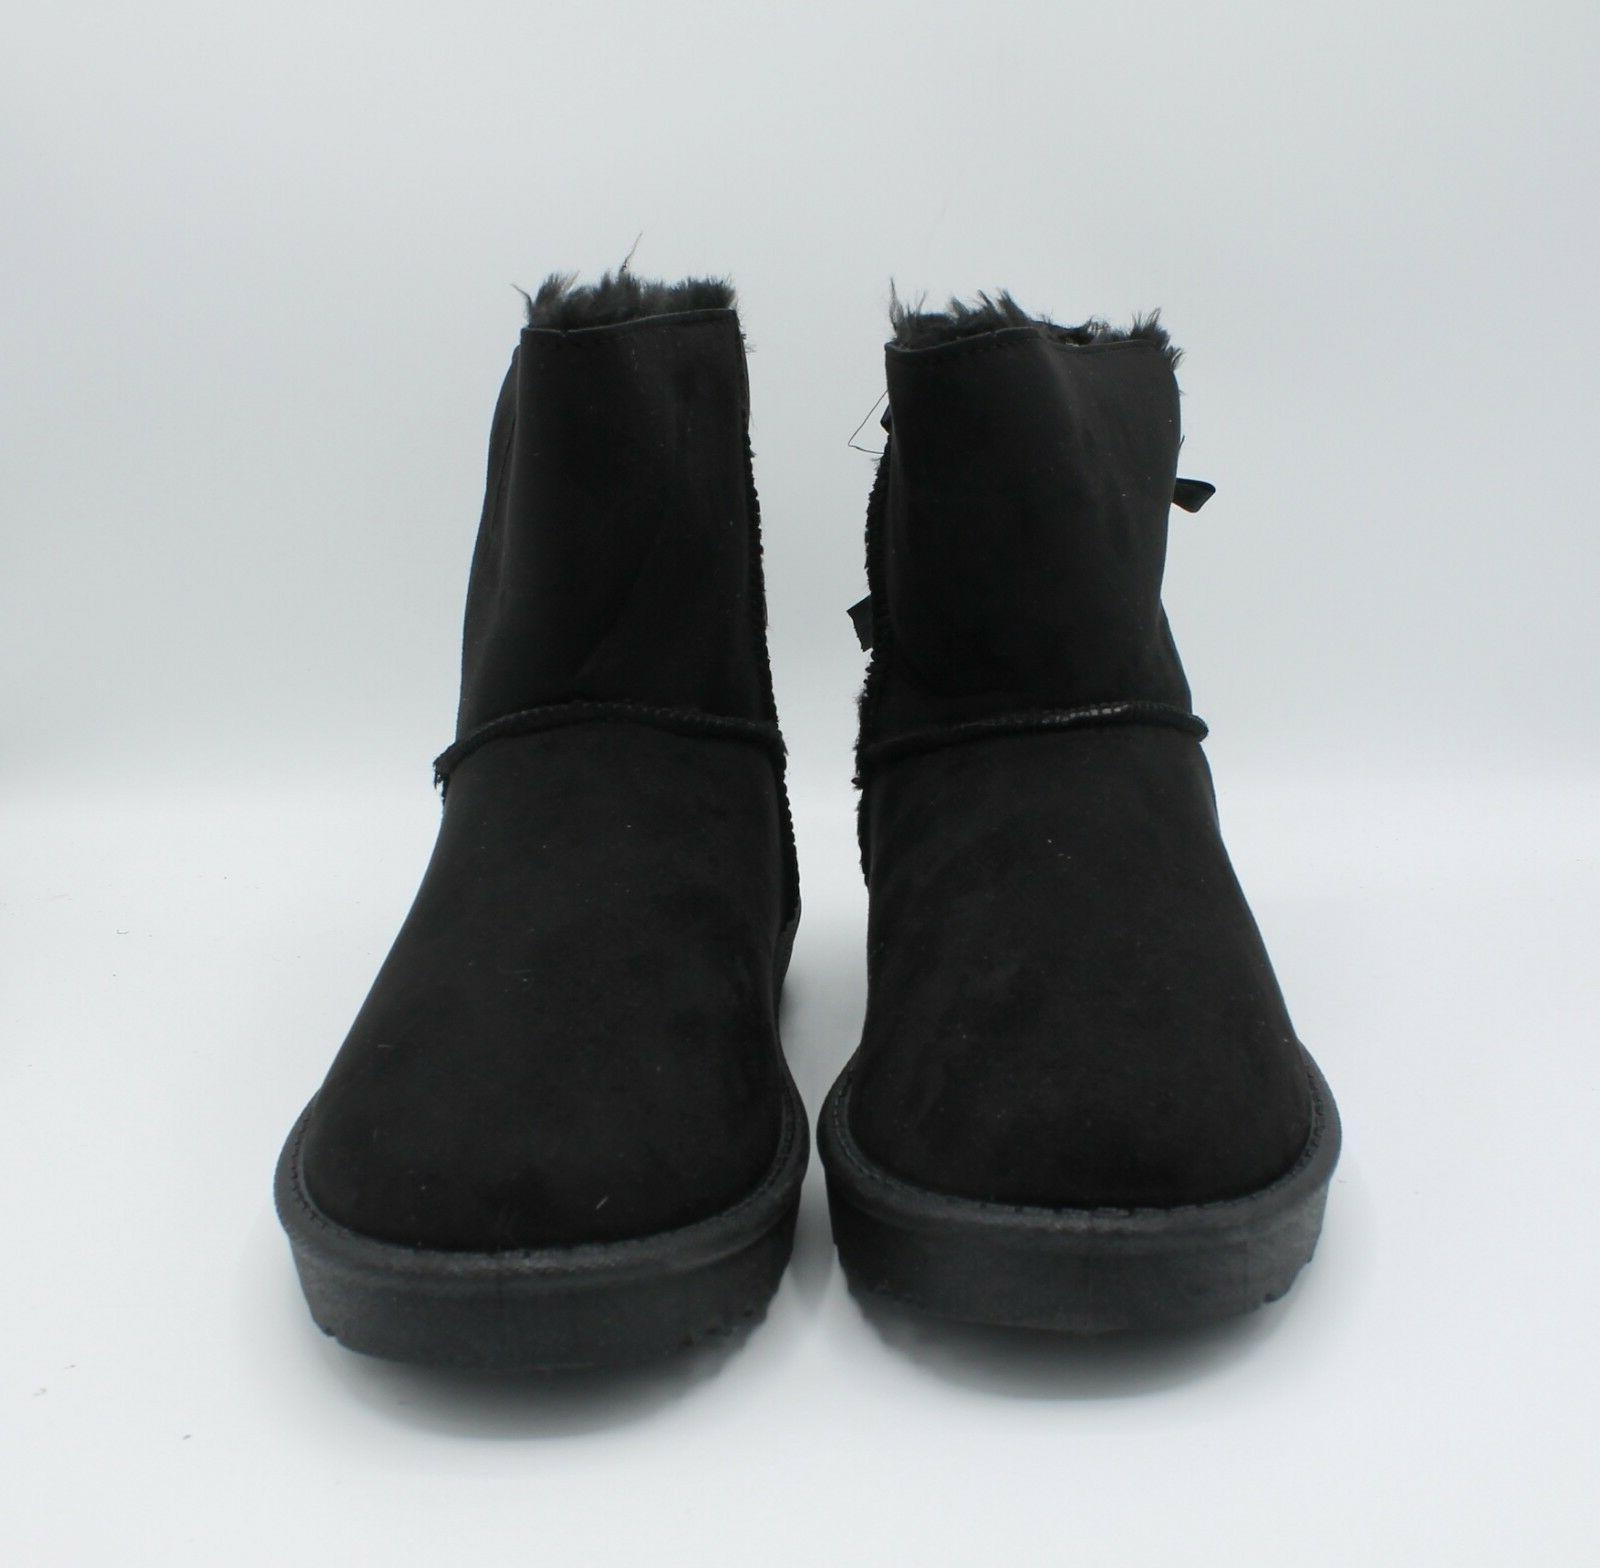 Boots Winter Fur Hair boots